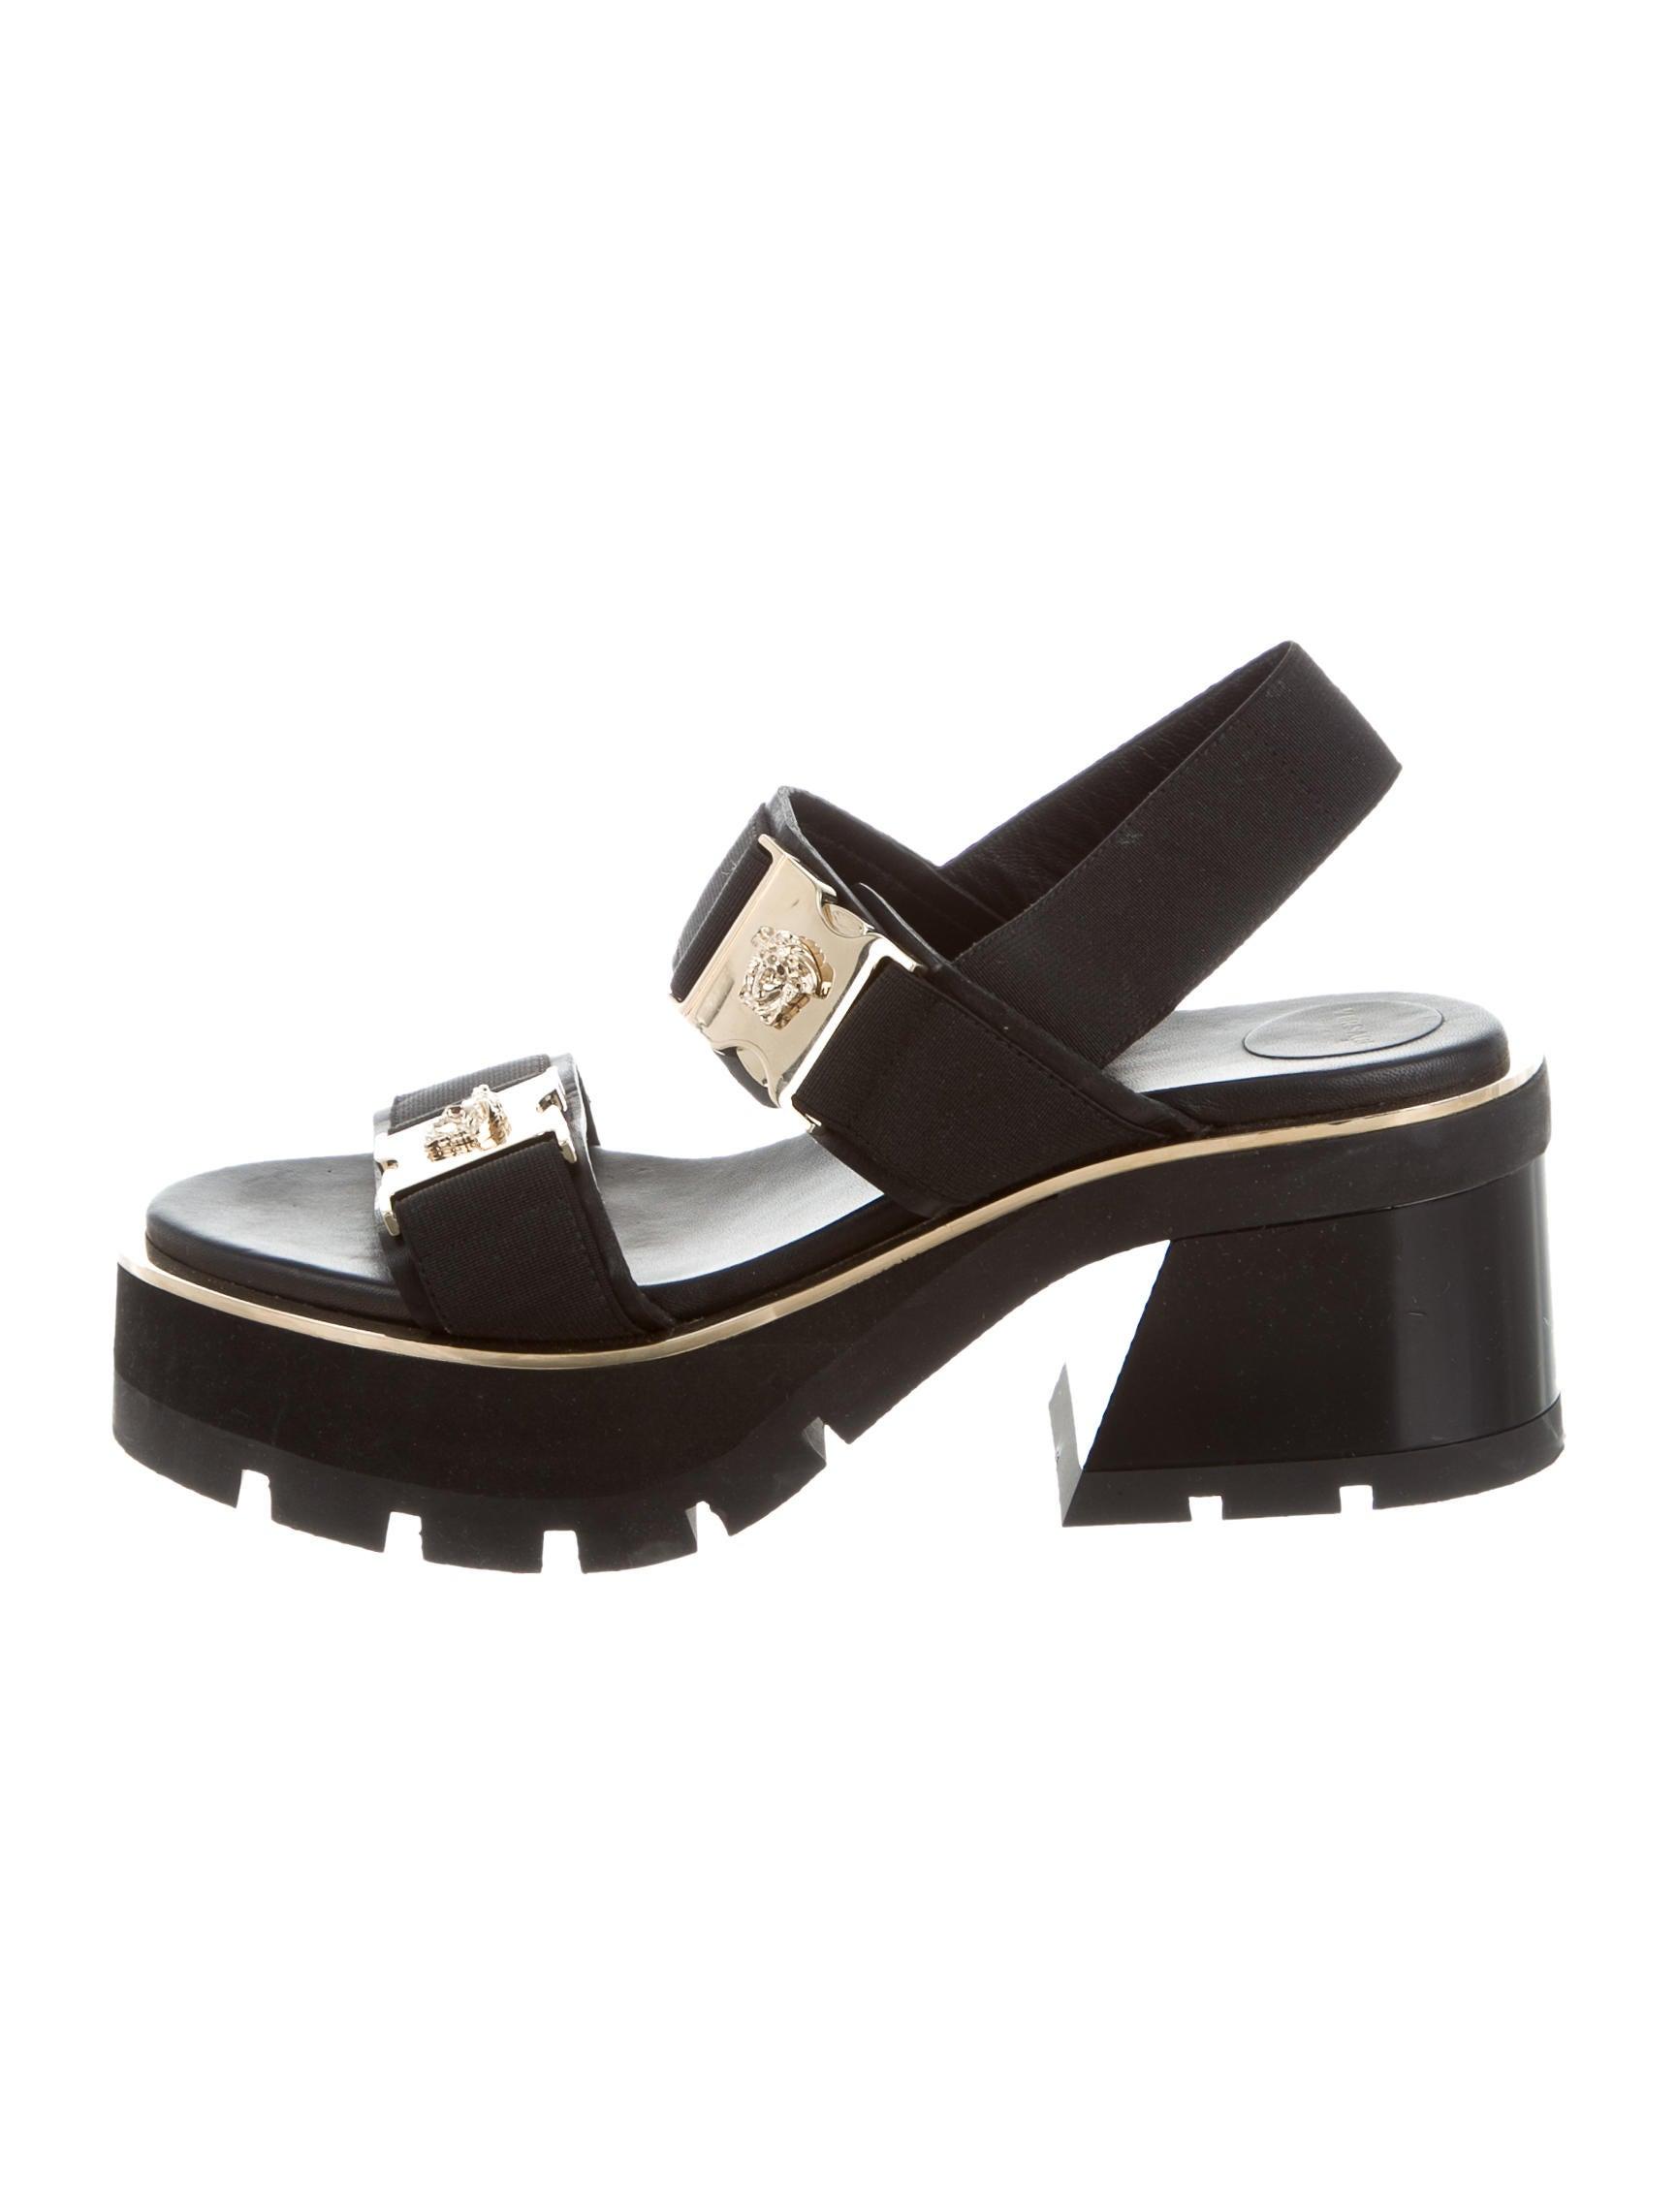 Versace Medusa Flatform Sandals - Shoes - VES30725 | The RealReal